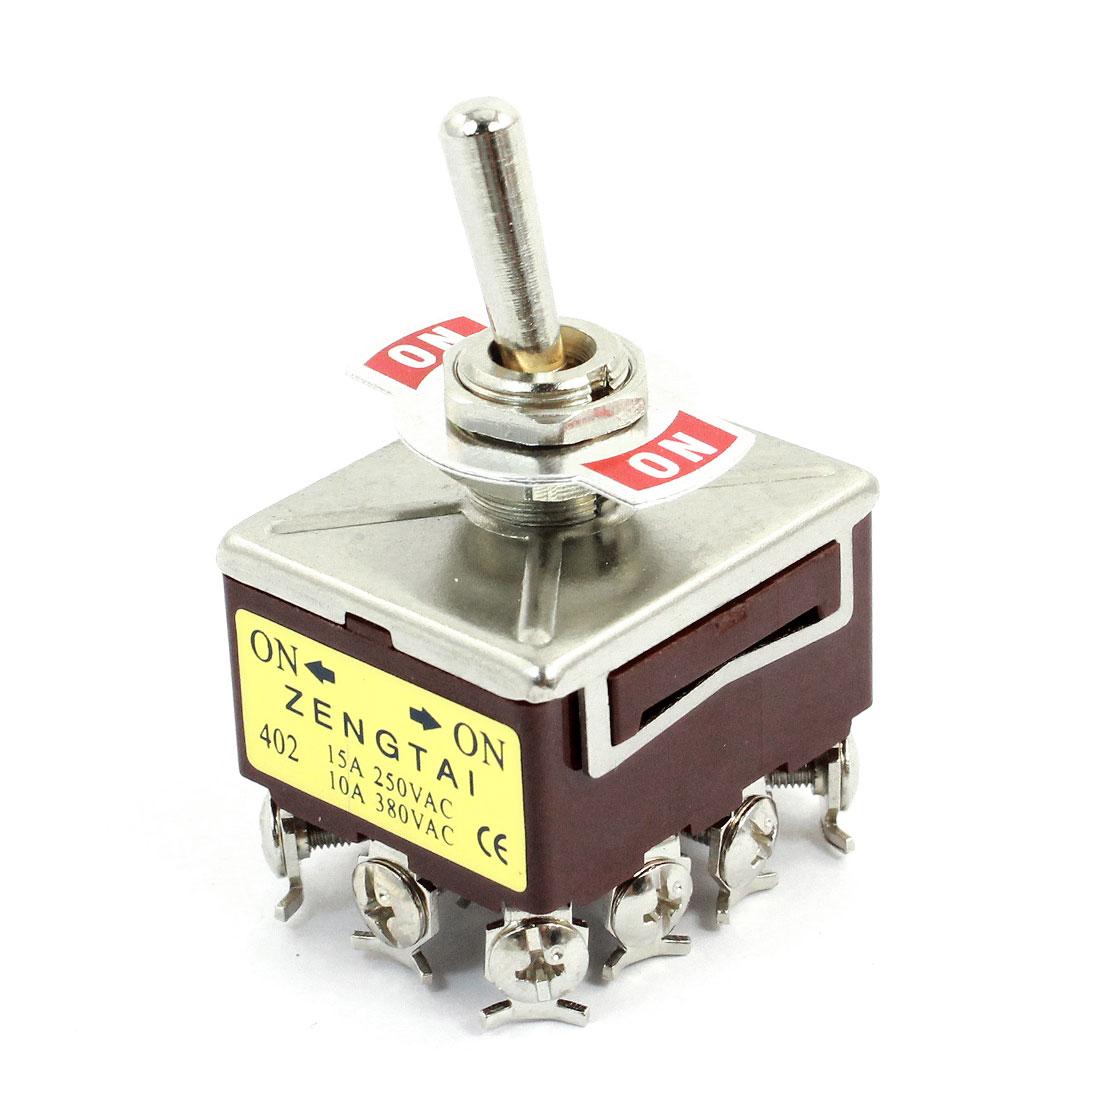 AC380V/10A AC250V/15A 12 Pin 3PDT ON/ON 2 Position Toggle Switch